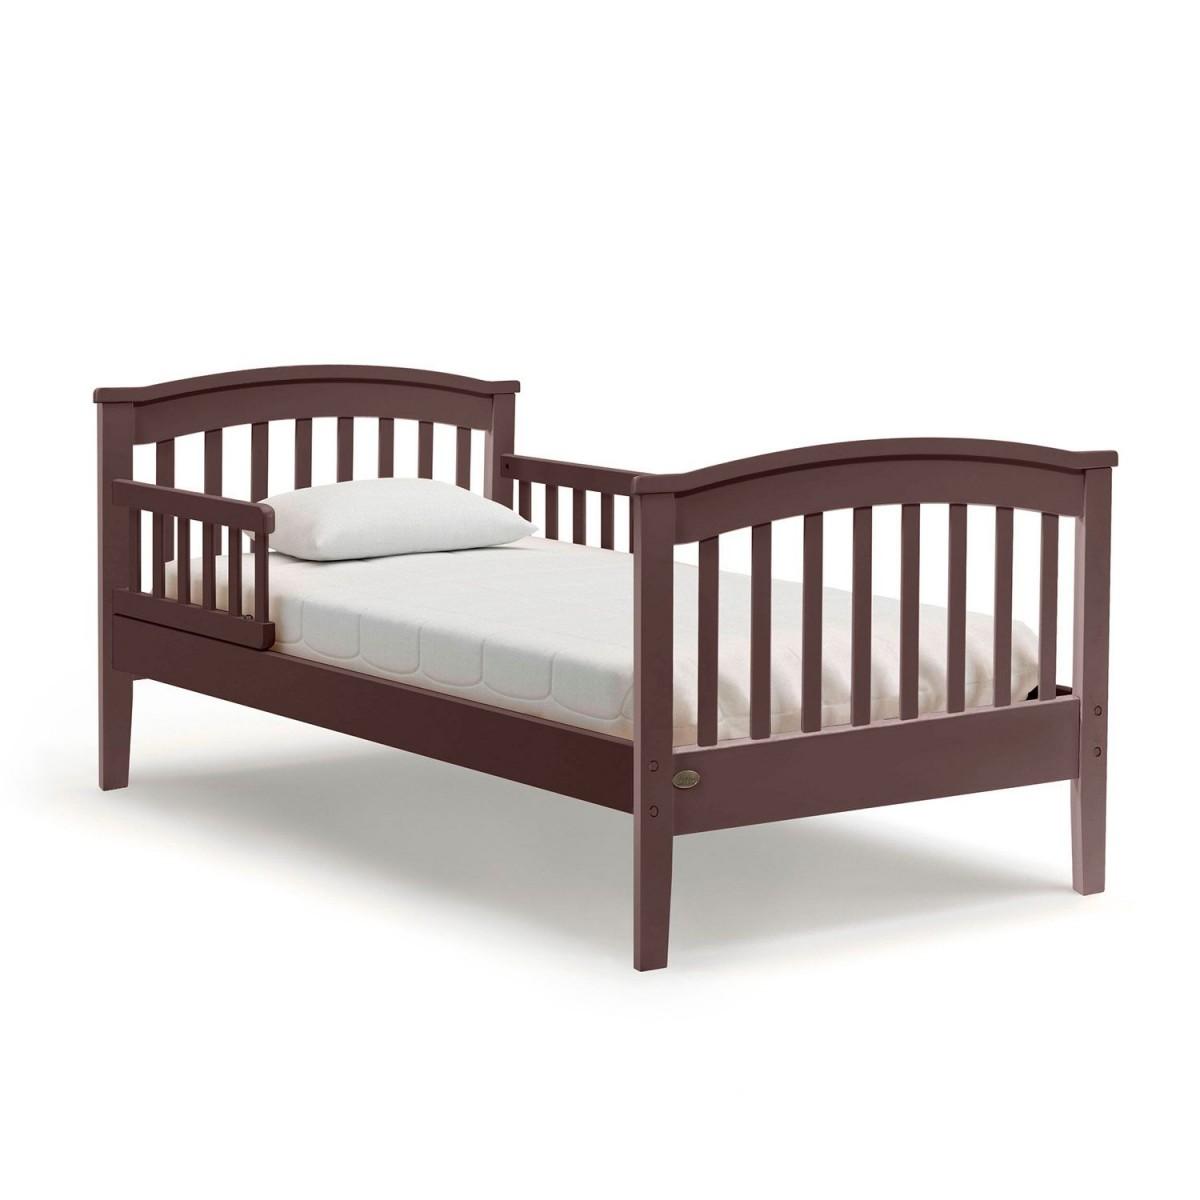 Nuovita Perla lungo кровать подростковая